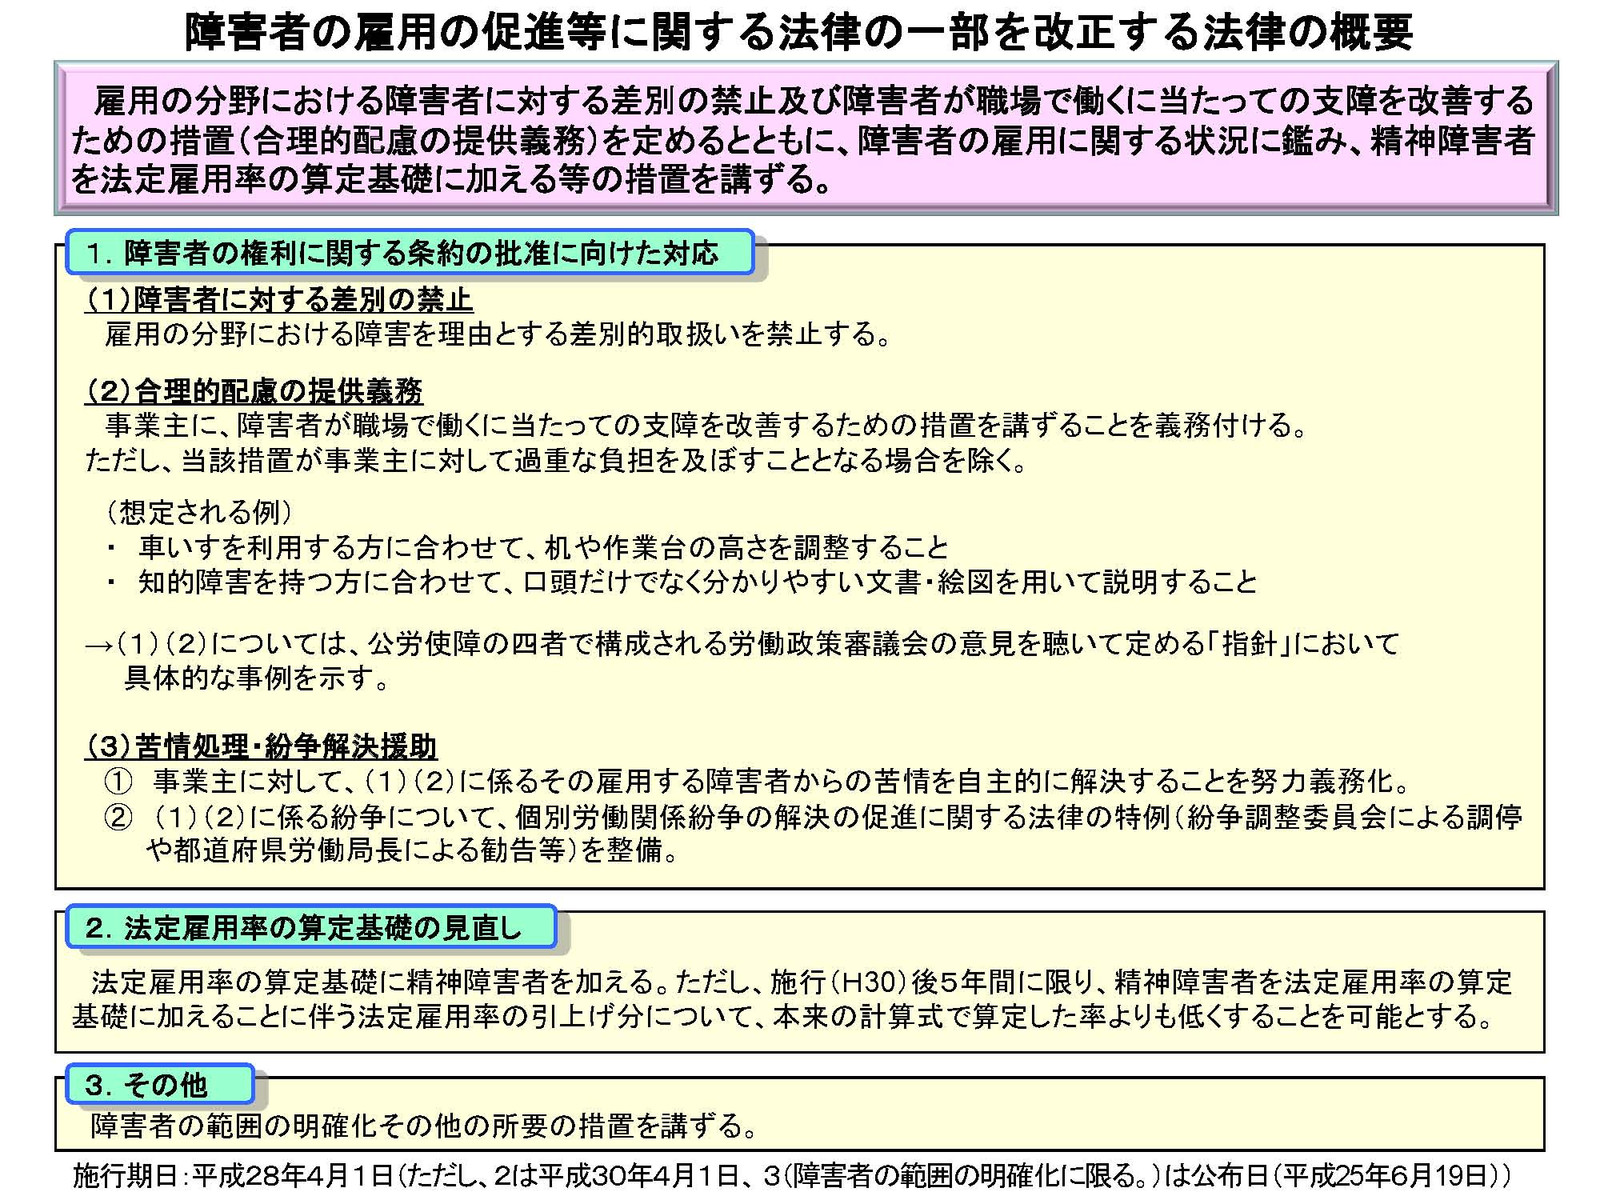 Kaisei02__1_2